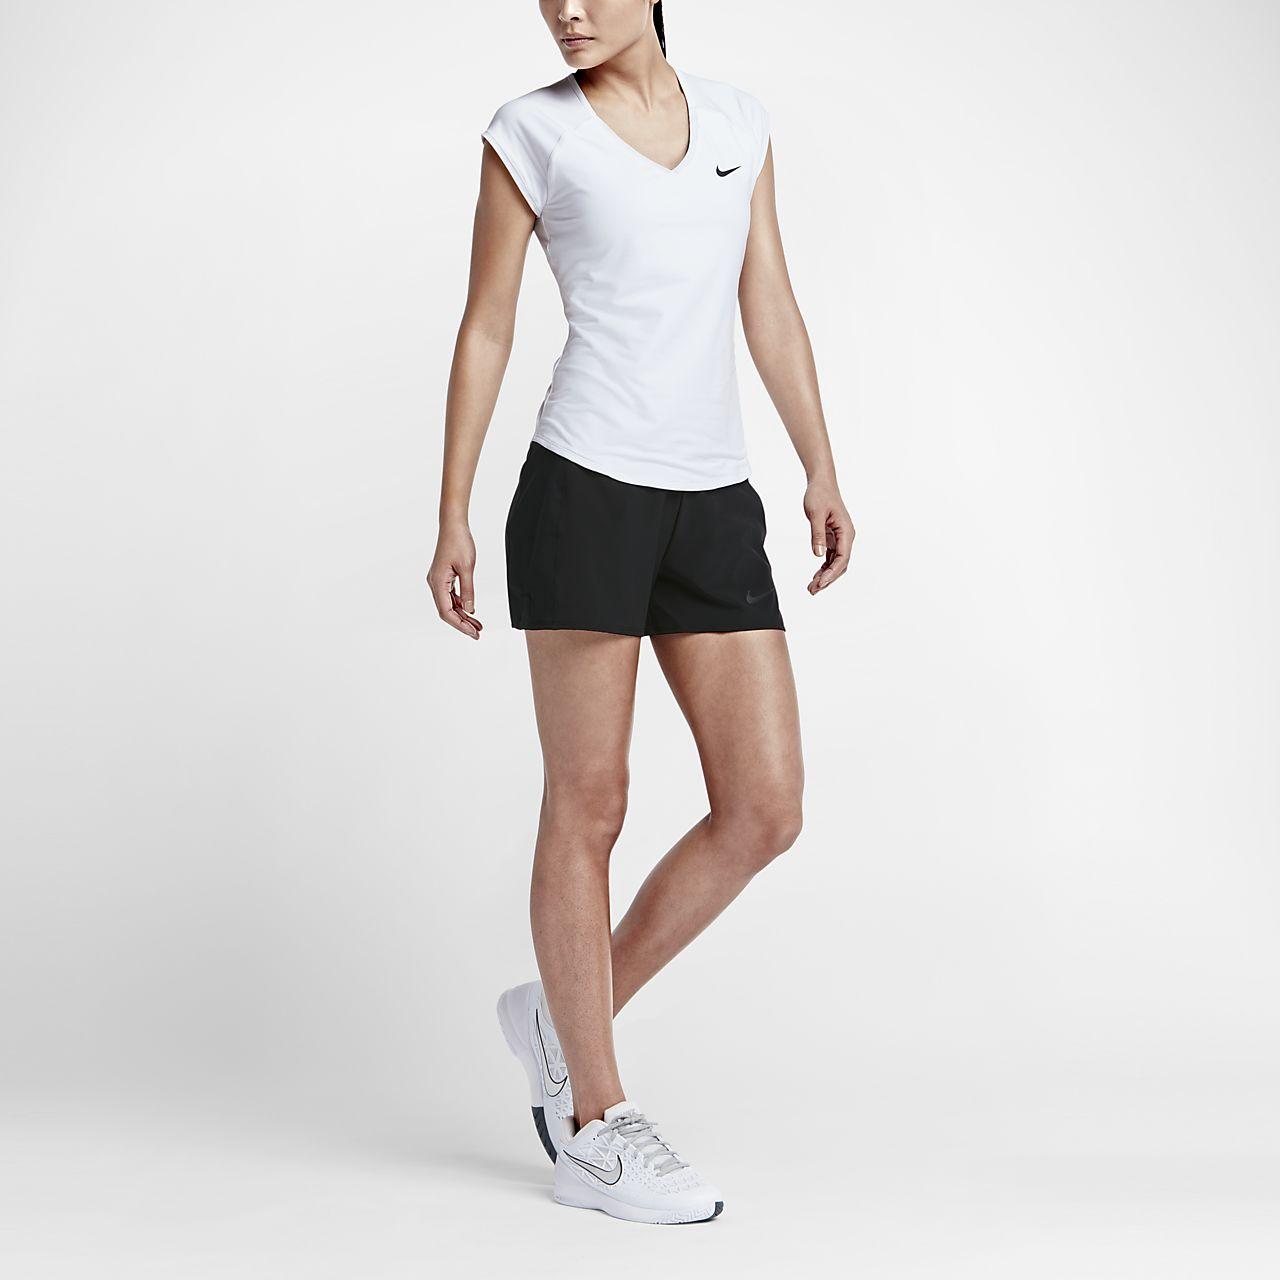 NikeCourt Pure Women's Tennis Top